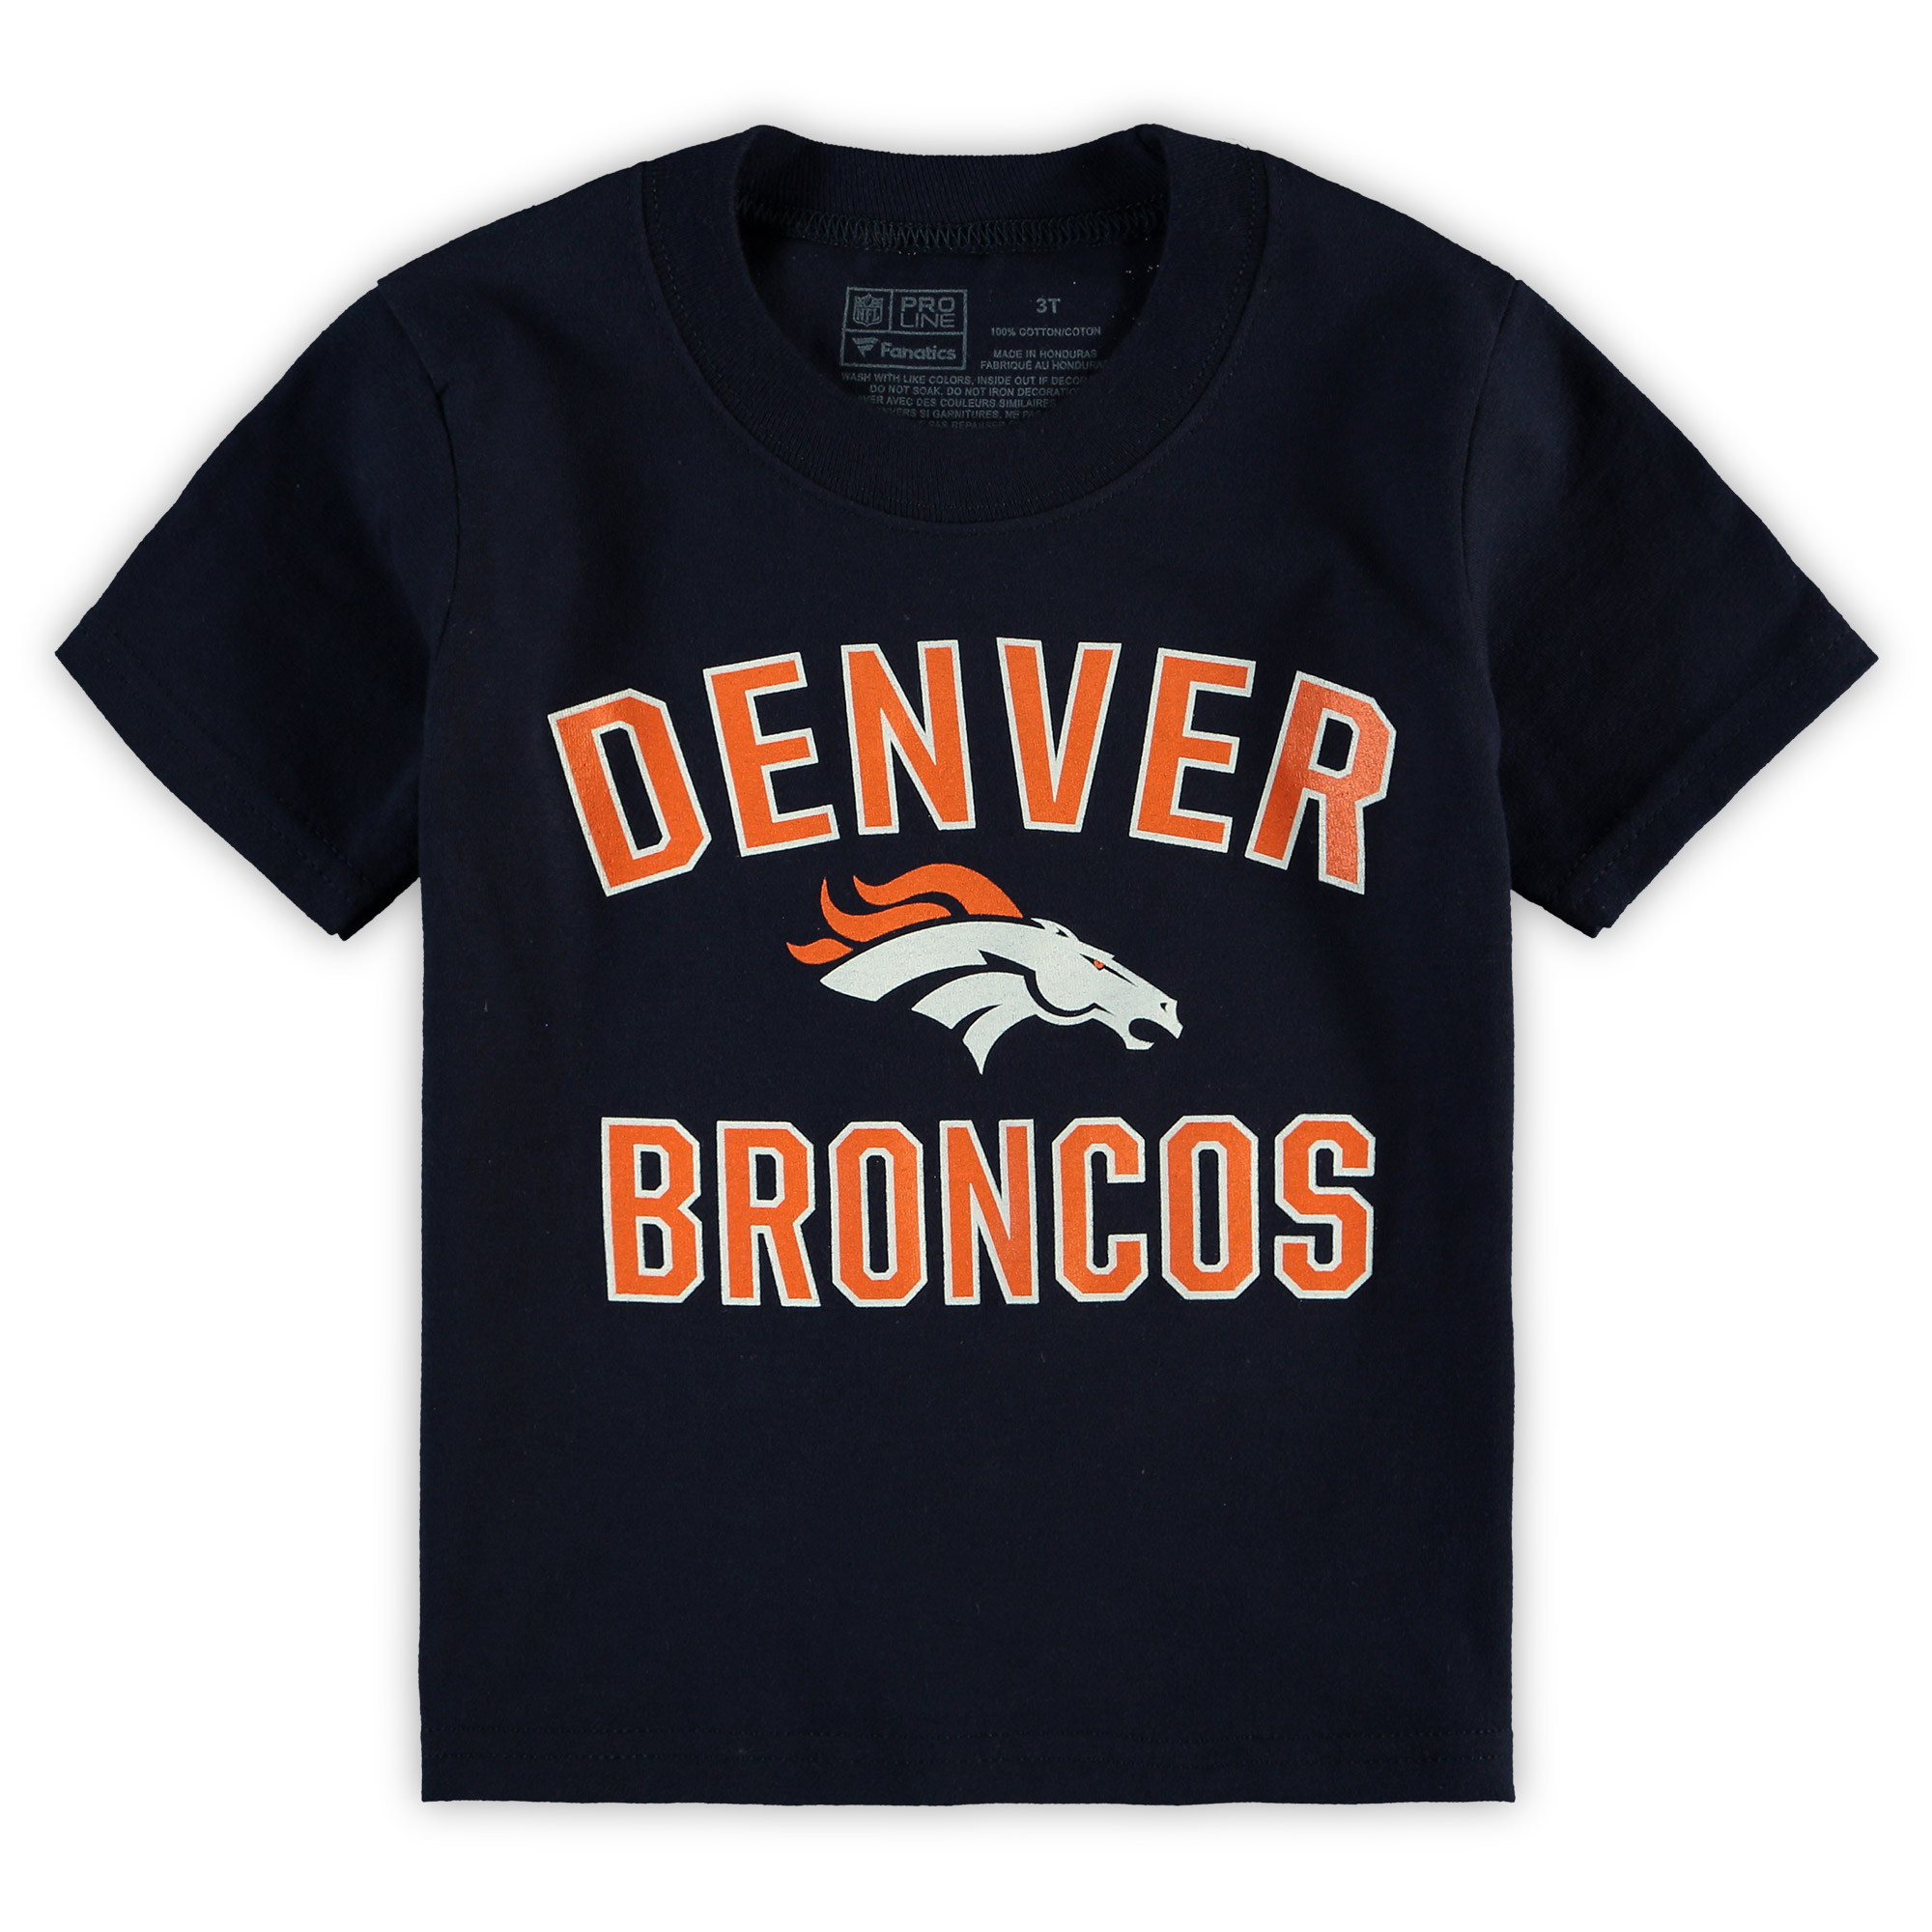 Denver Broncos NFL Pro Line by Fanatics Branded Toddler Team Victory Arch T-Shirt - Navy